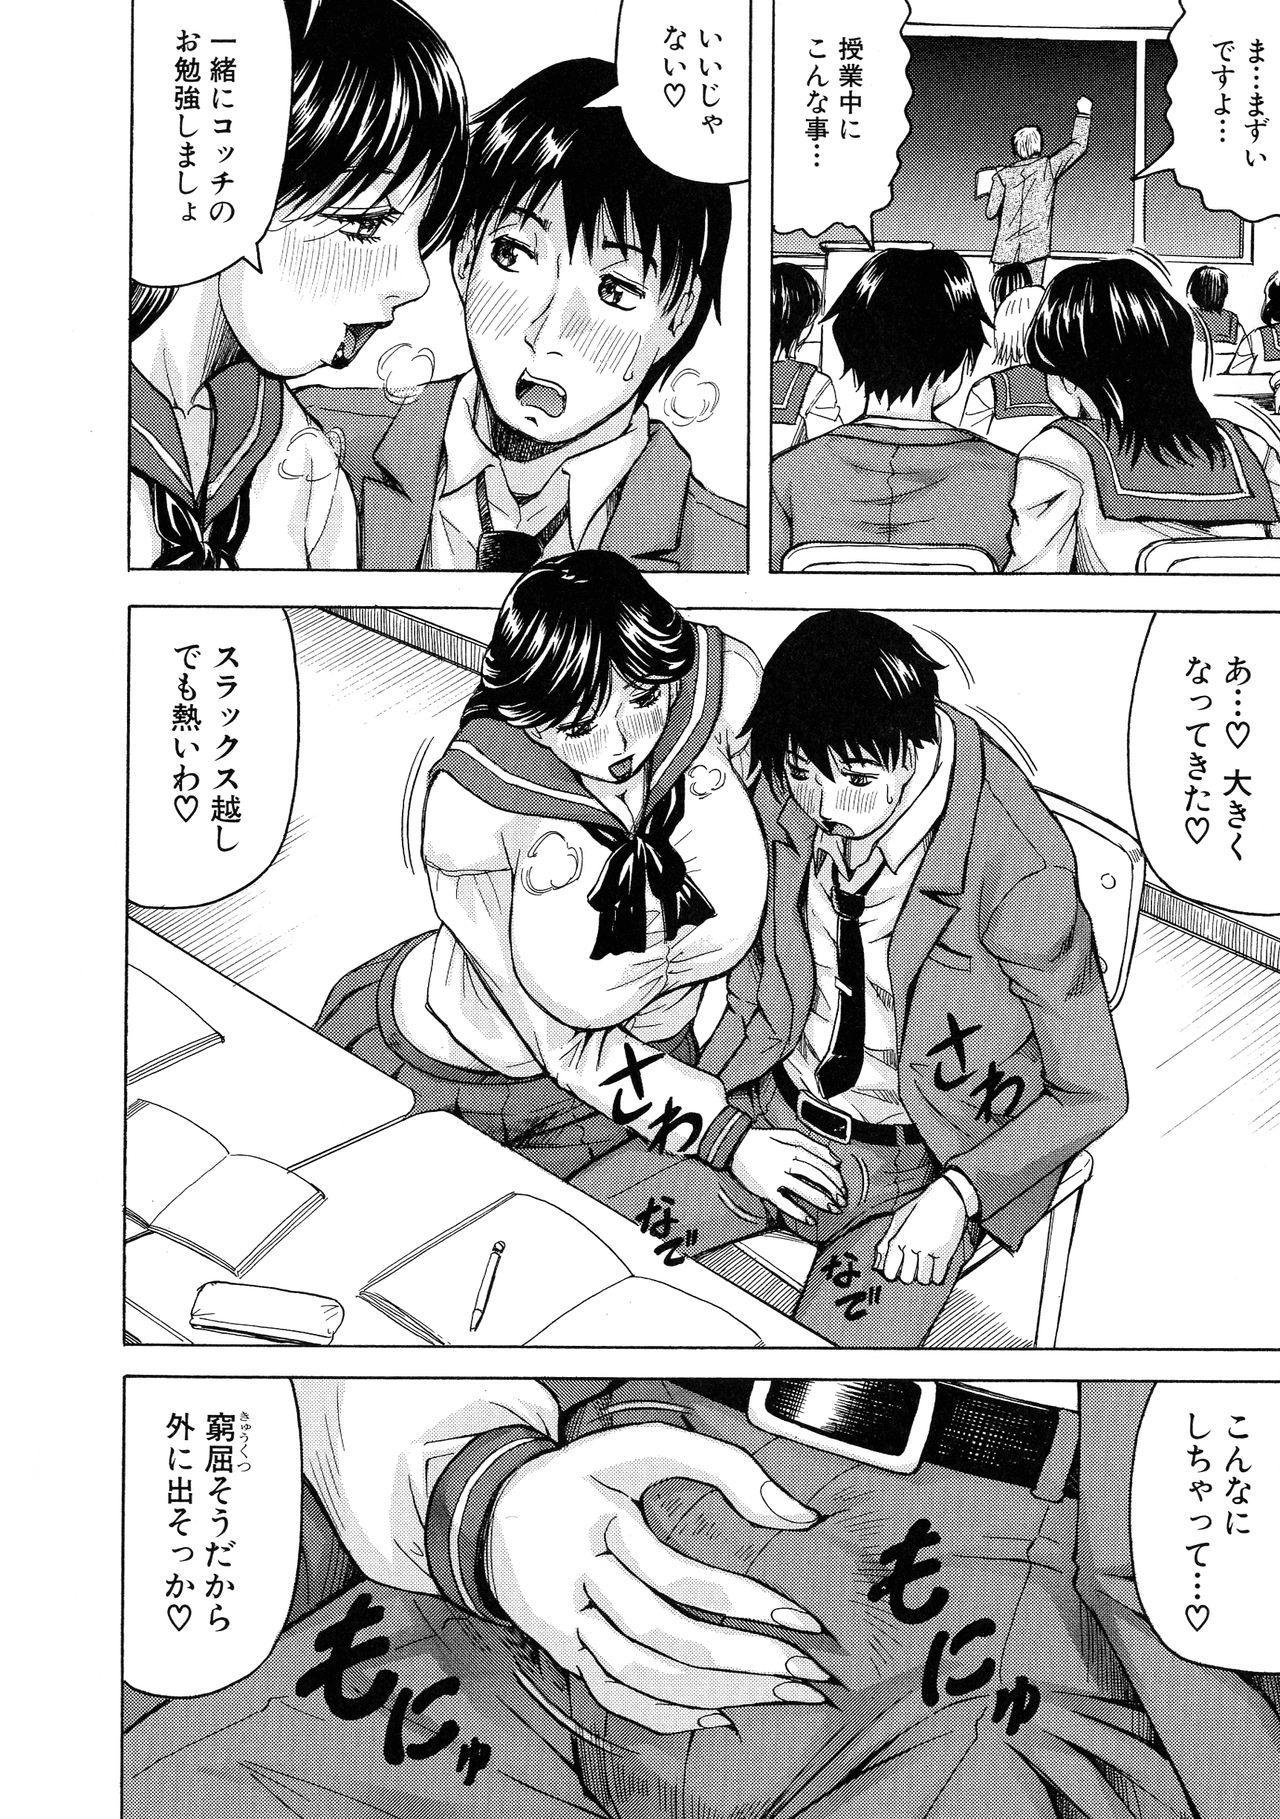 [Jamming] Jukujo Gakuen ~ Classmate wa Zen'in Jukujo ~ Okiniiri Touroku 11